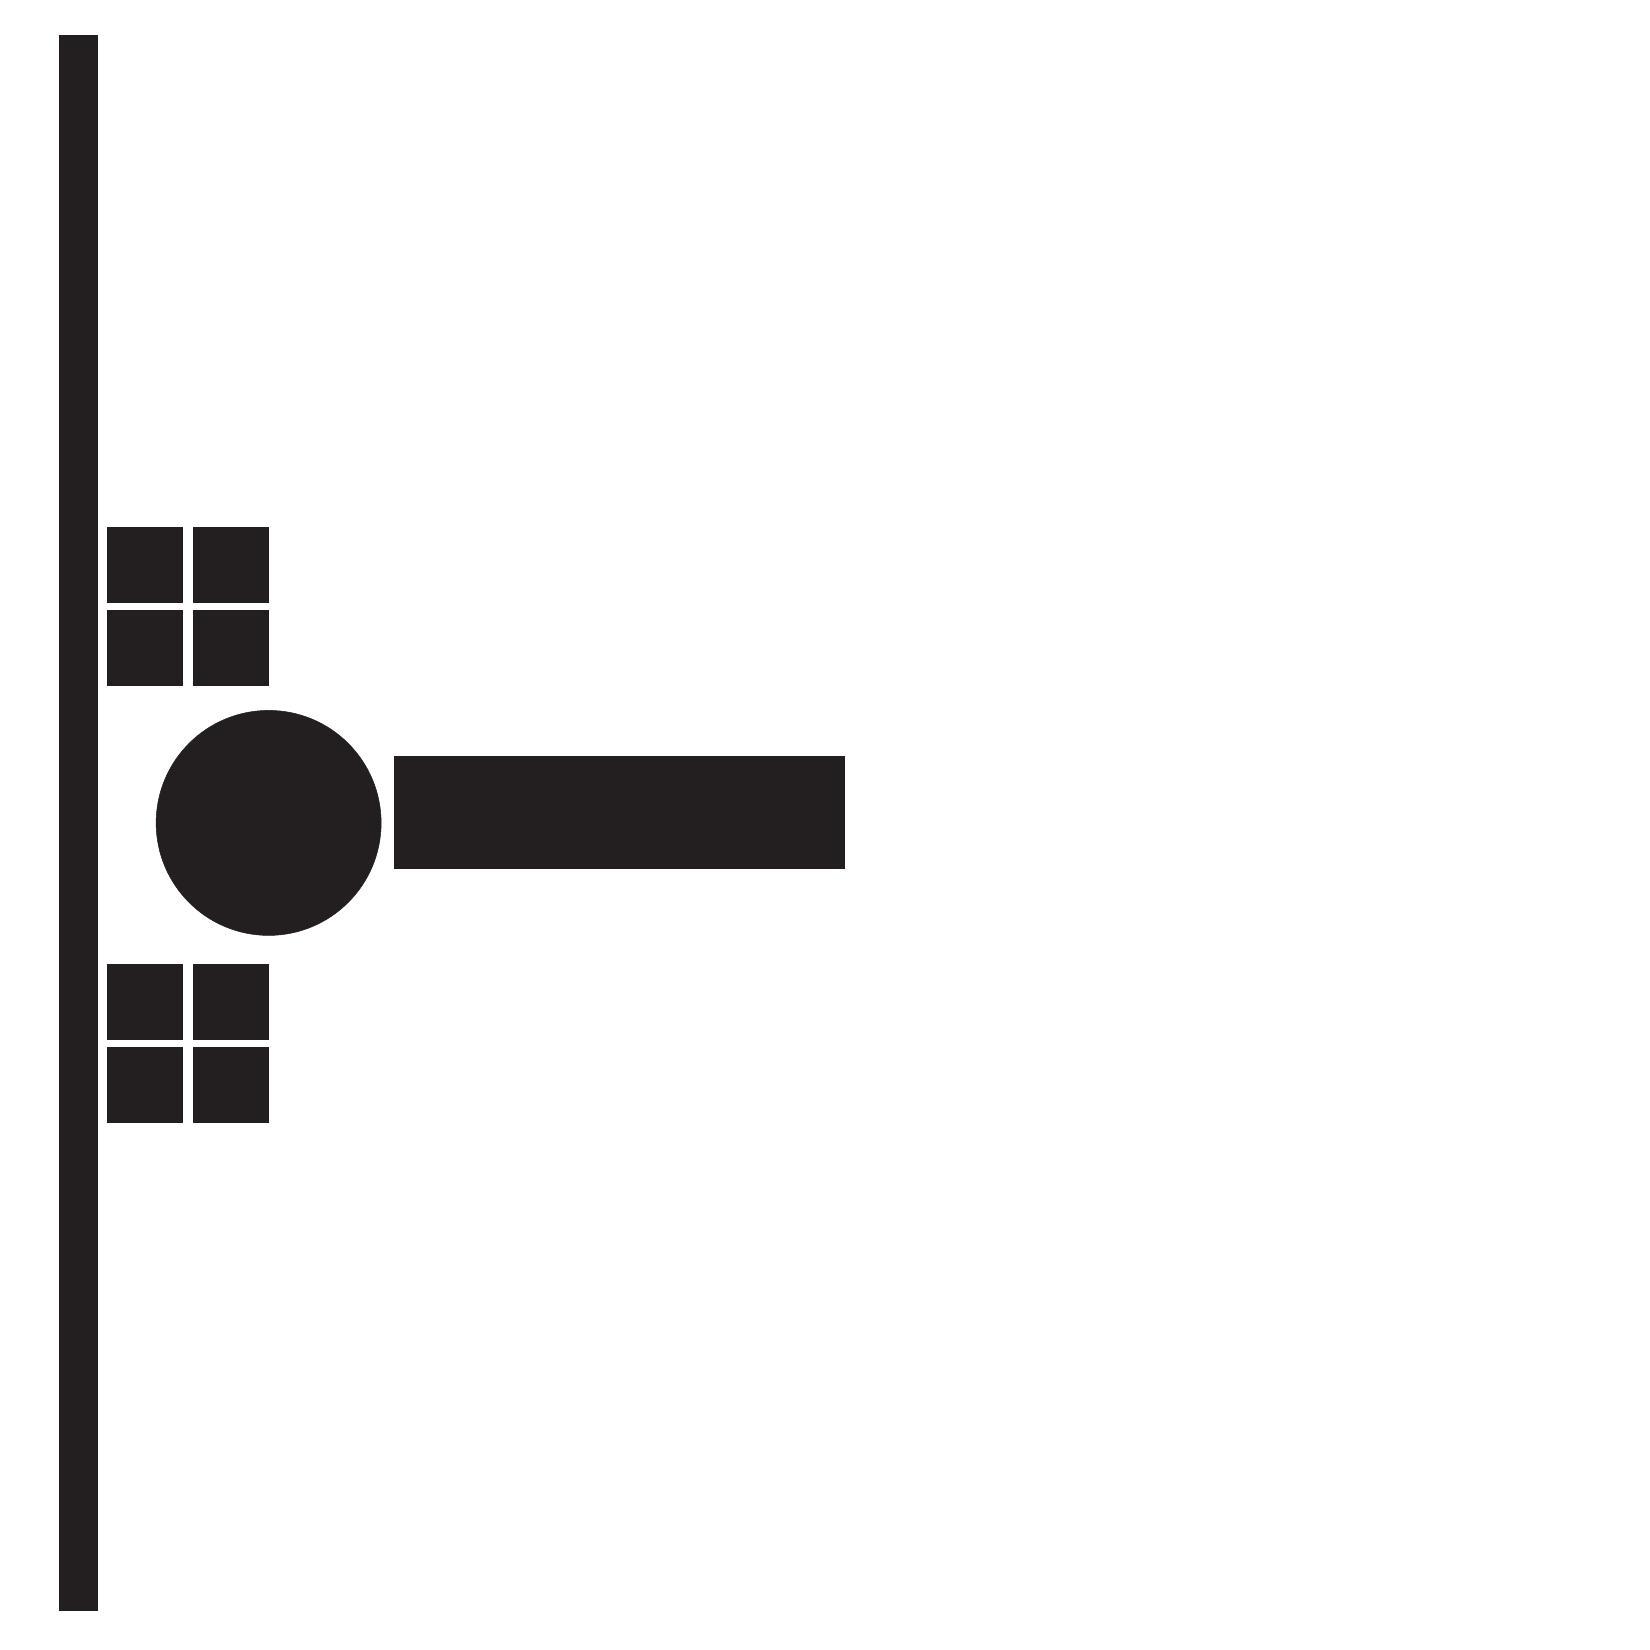 Assignment5_process2_#3_shapes_000001.jpg